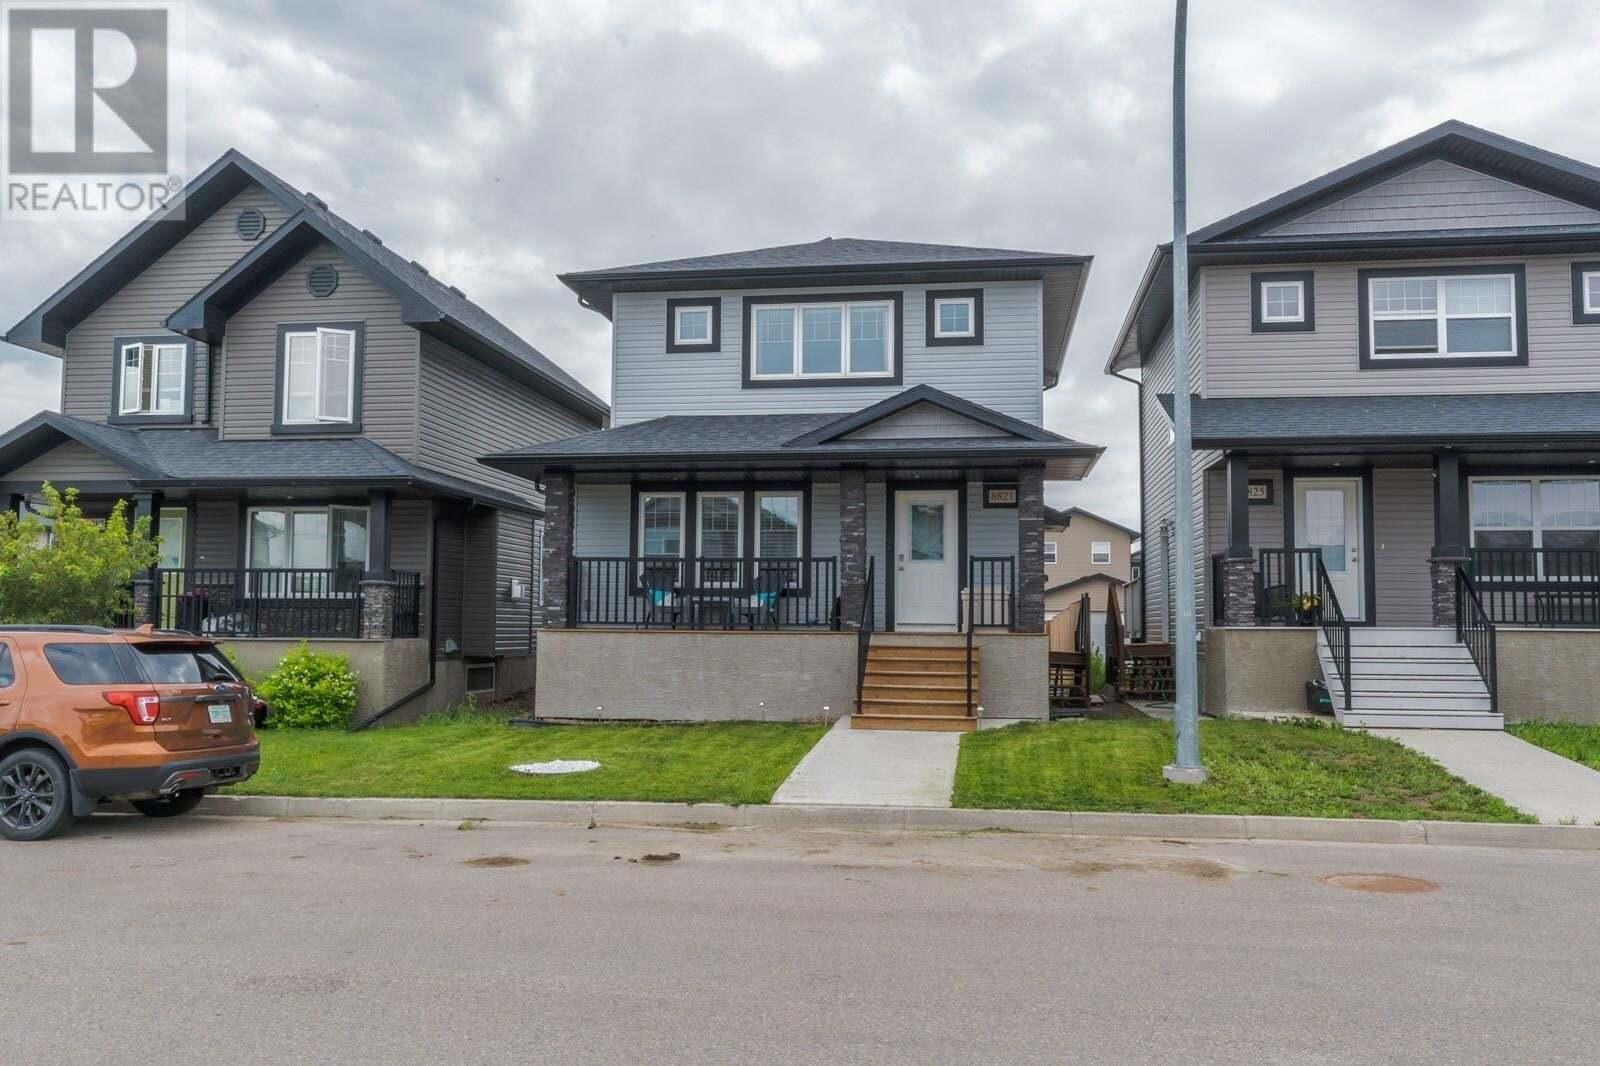 House for sale at 8821 Herman Cres Regina Saskatchewan - MLS: SK814754